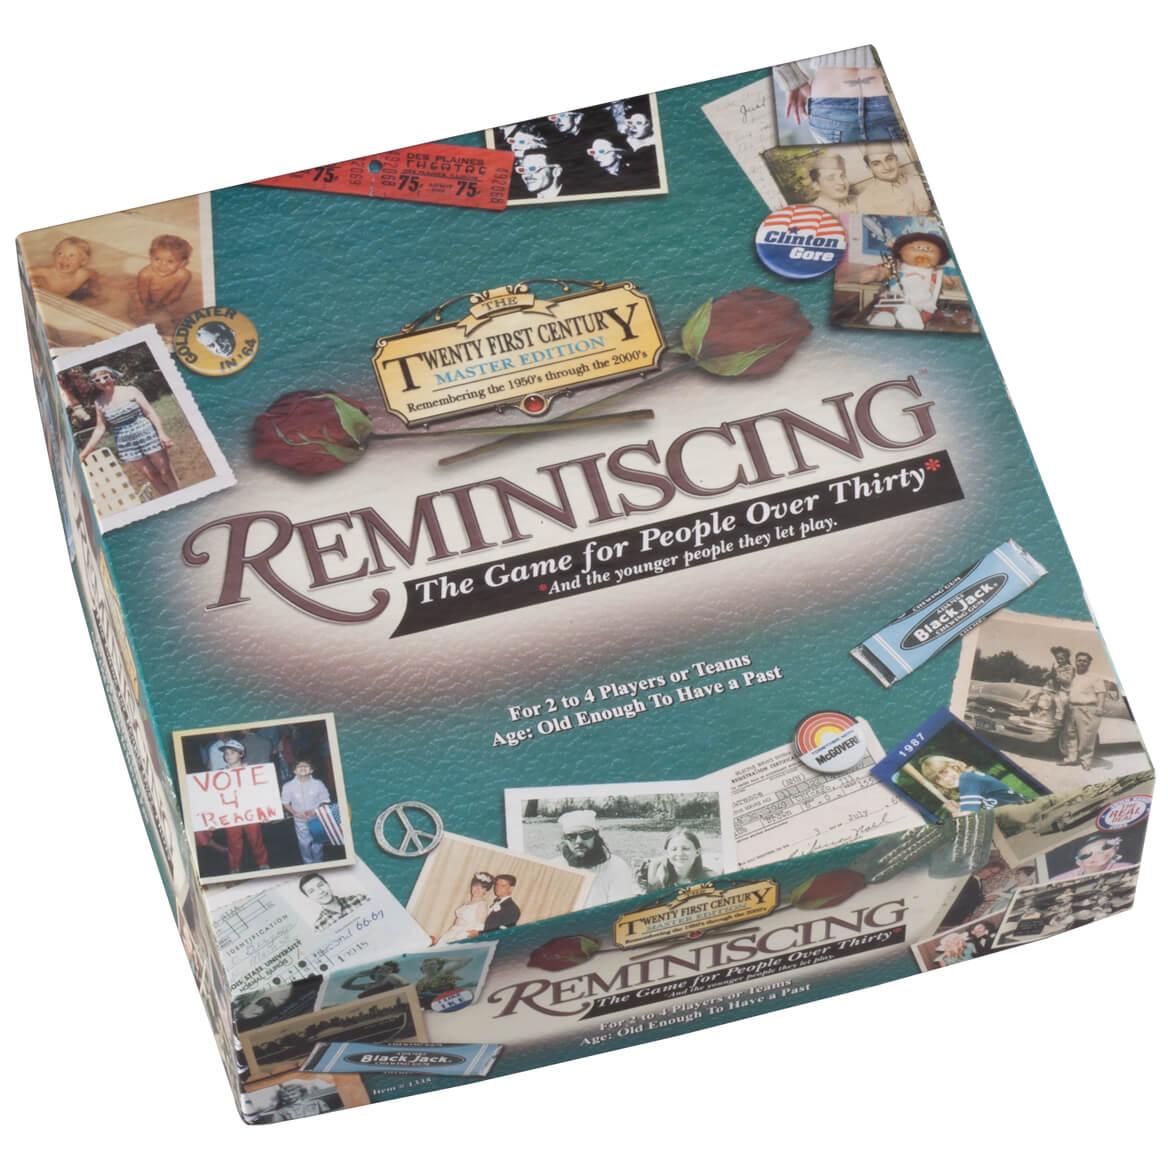 Reminiscing Game